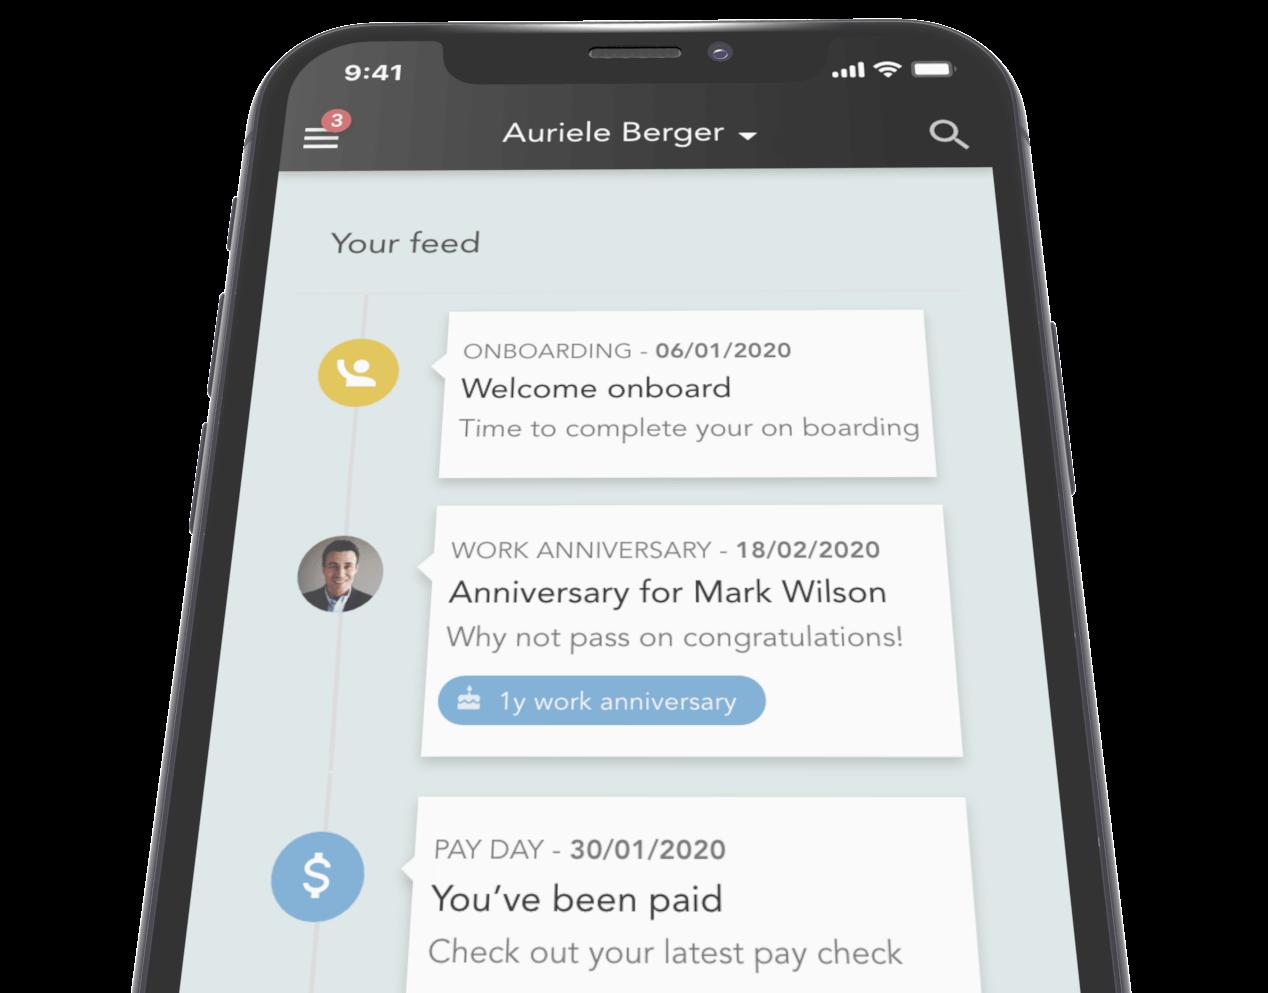 Applaud-HR-Feed-iPhone-Timeline